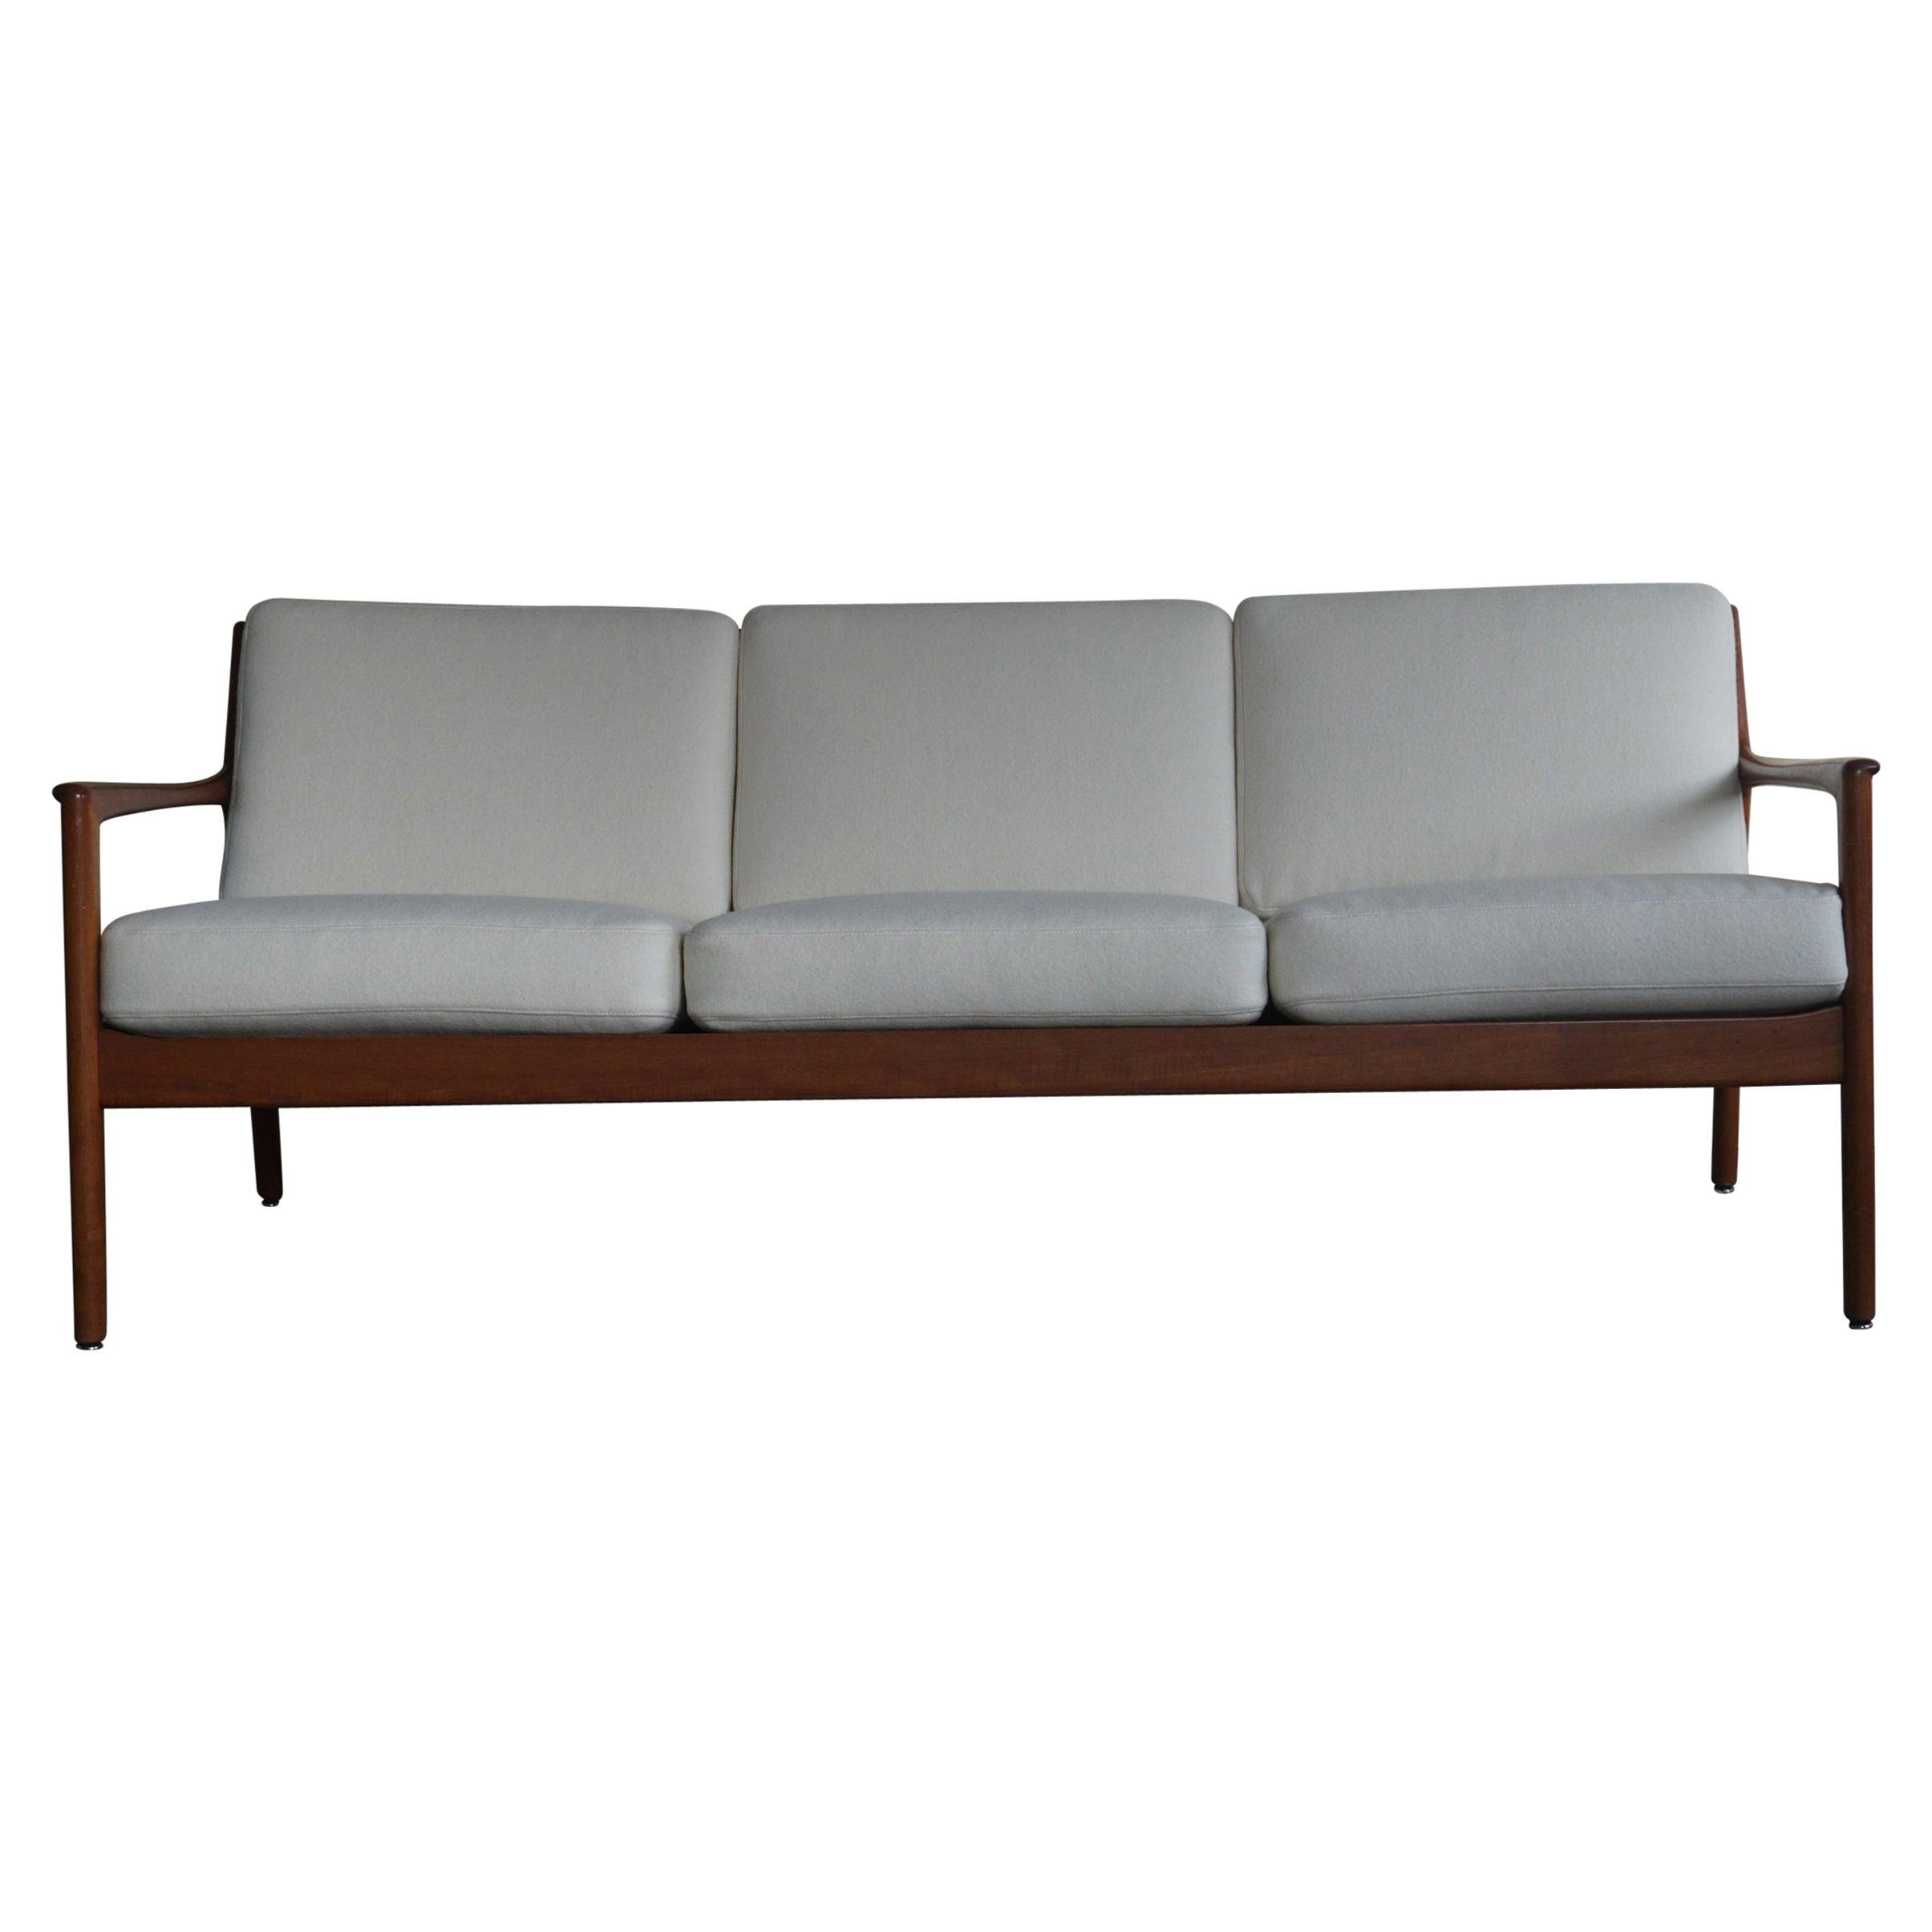 Modern Swedish Teak Model USA 75 3-Seat Sofa by Folke Ohlsson for DUX, 1960s